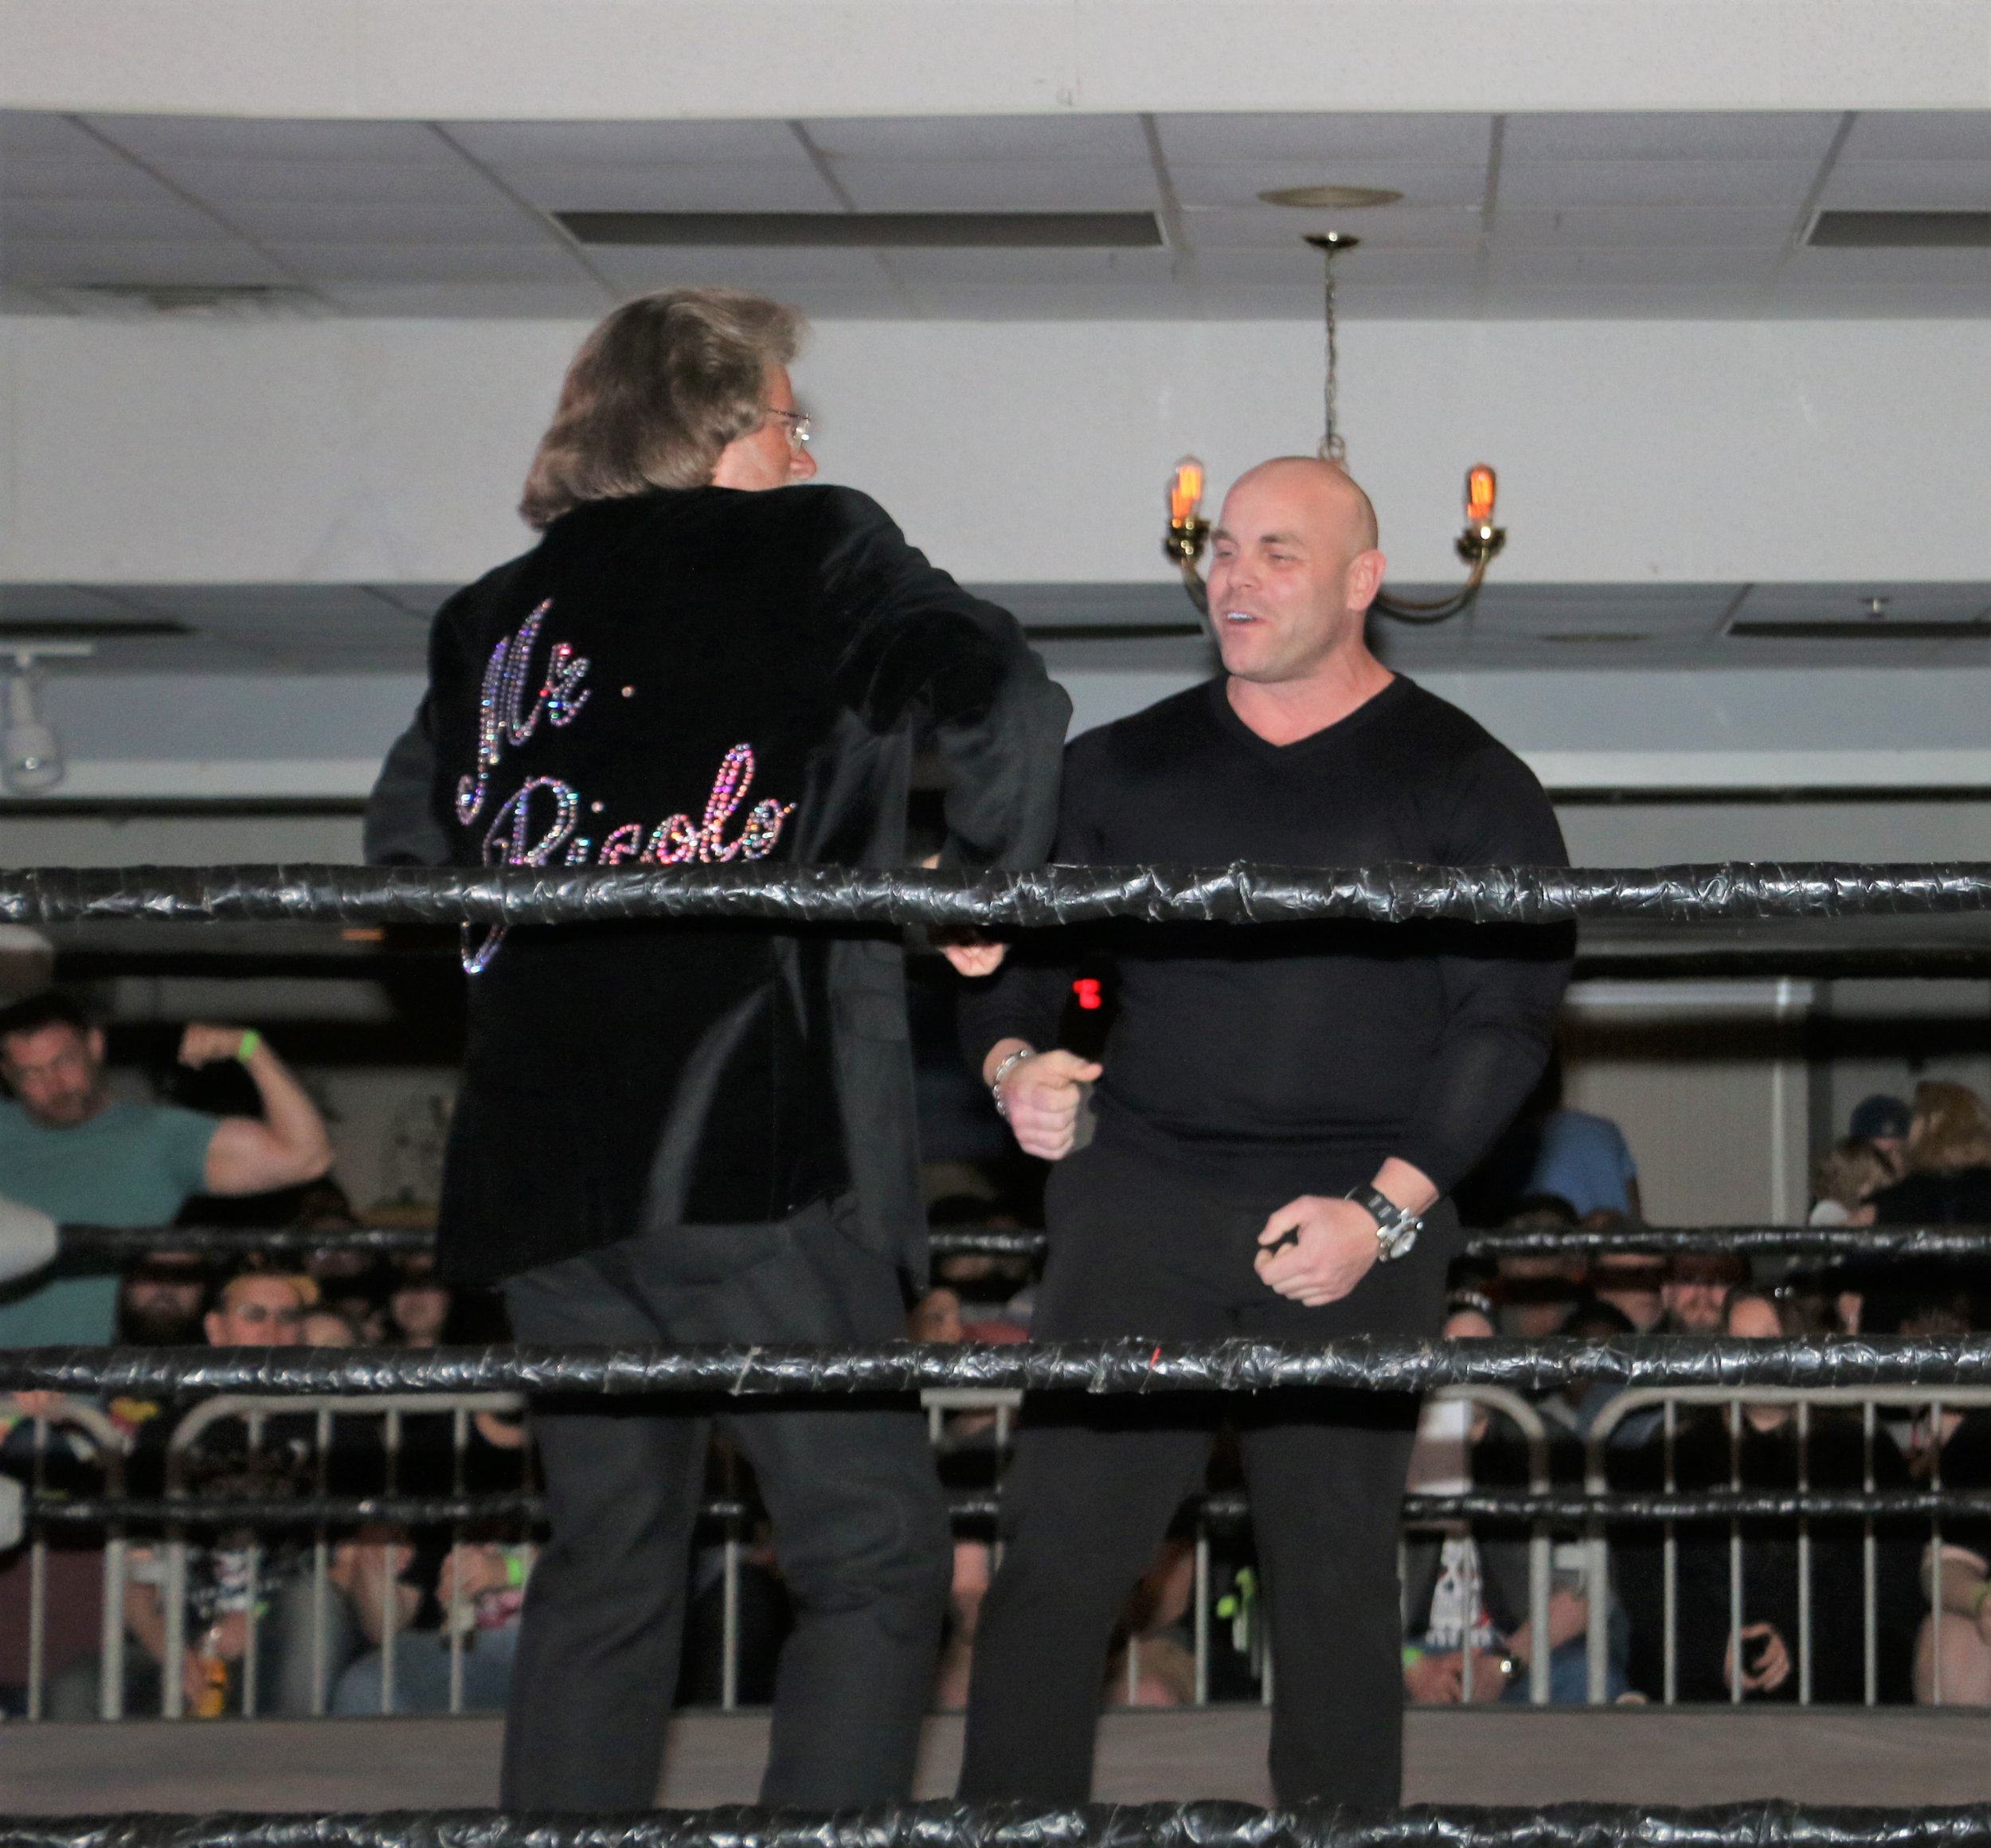 Mr. Ricolo greets bodybuilder David Baye.